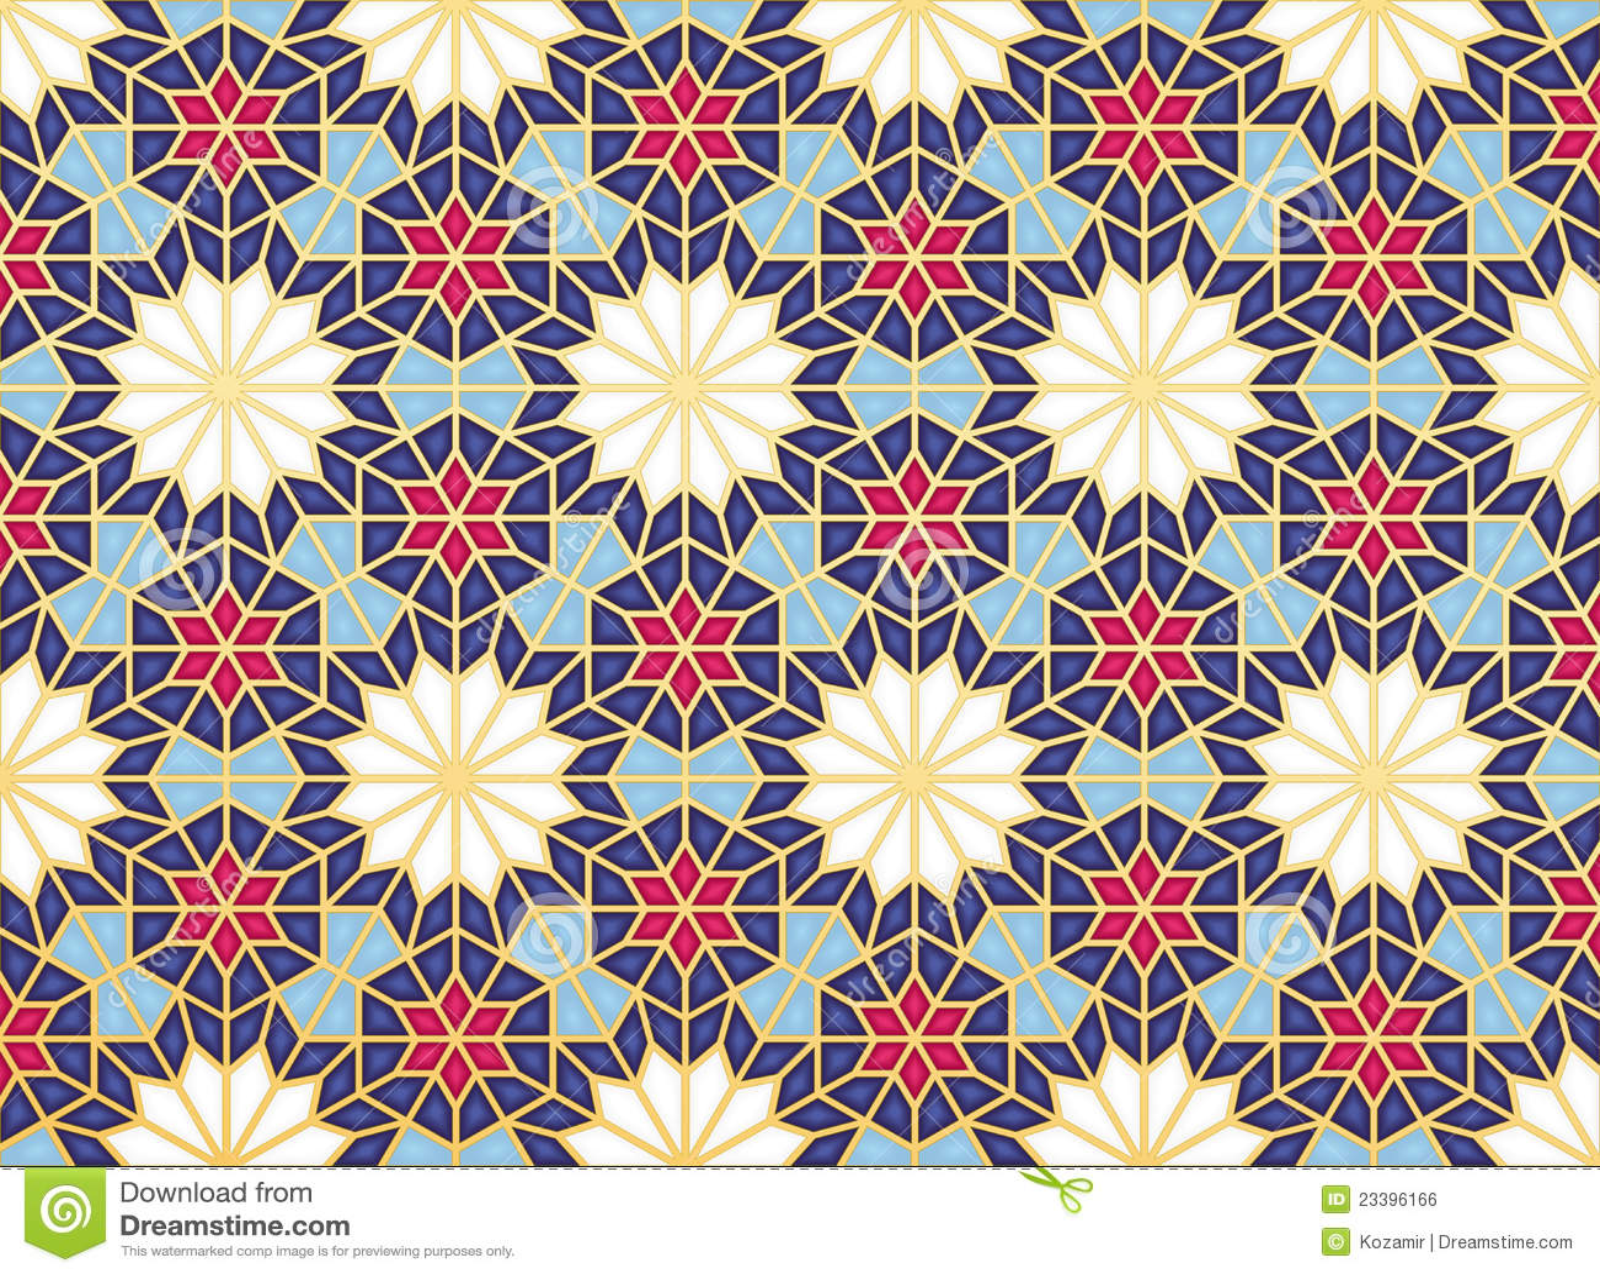 orientalisches muster lizenzfreies stockbild bild 23396166. Black Bedroom Furniture Sets. Home Design Ideas